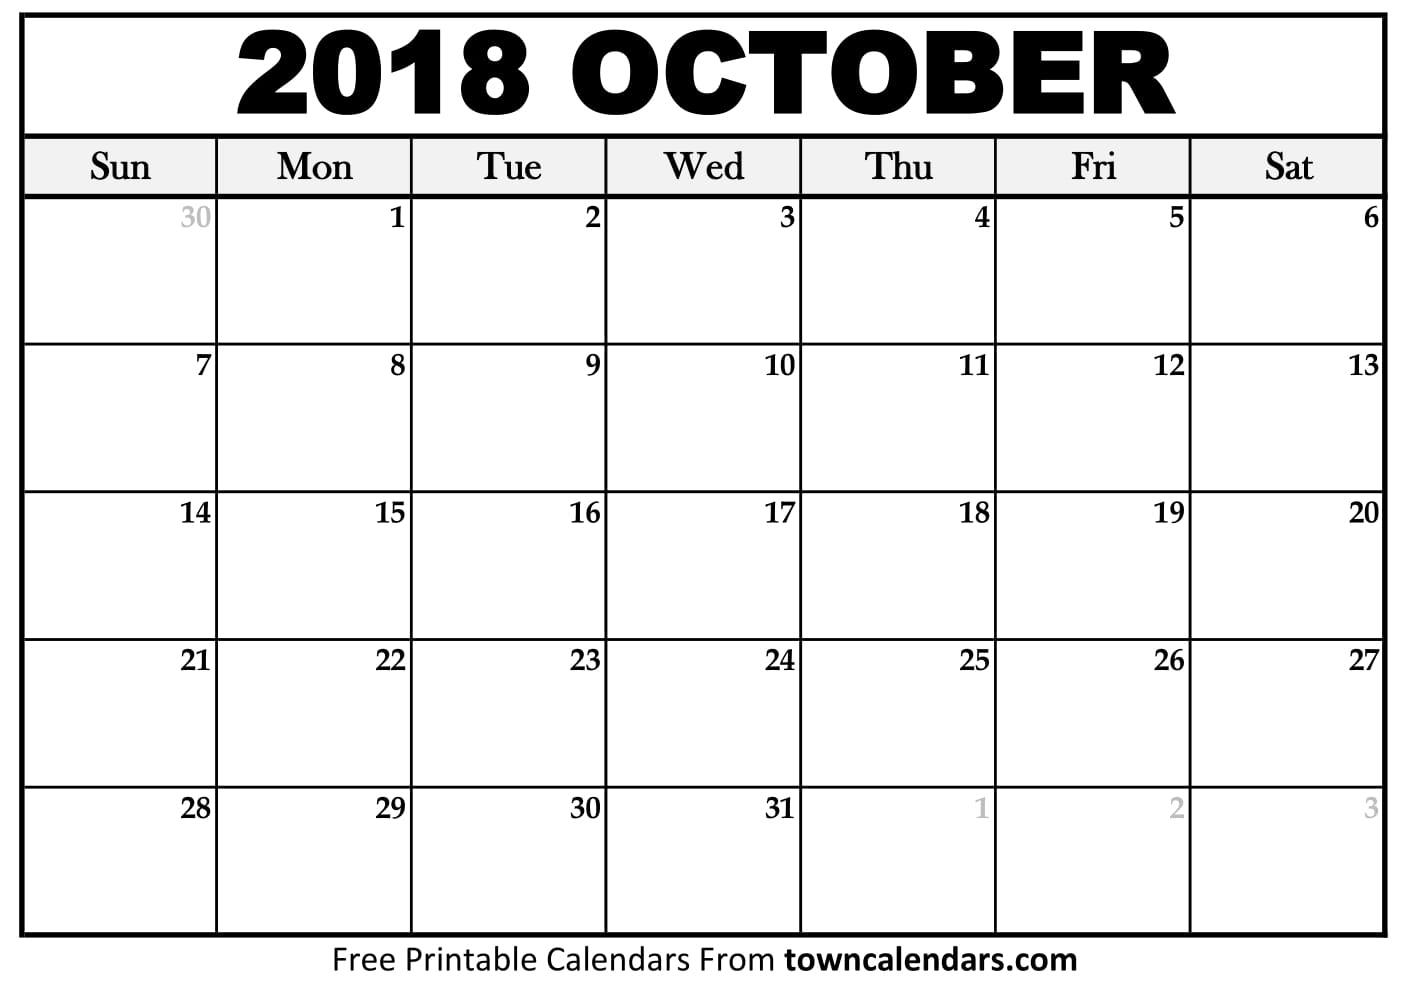 Calendar For October 2018 - Free August 2019 Calendar Printable